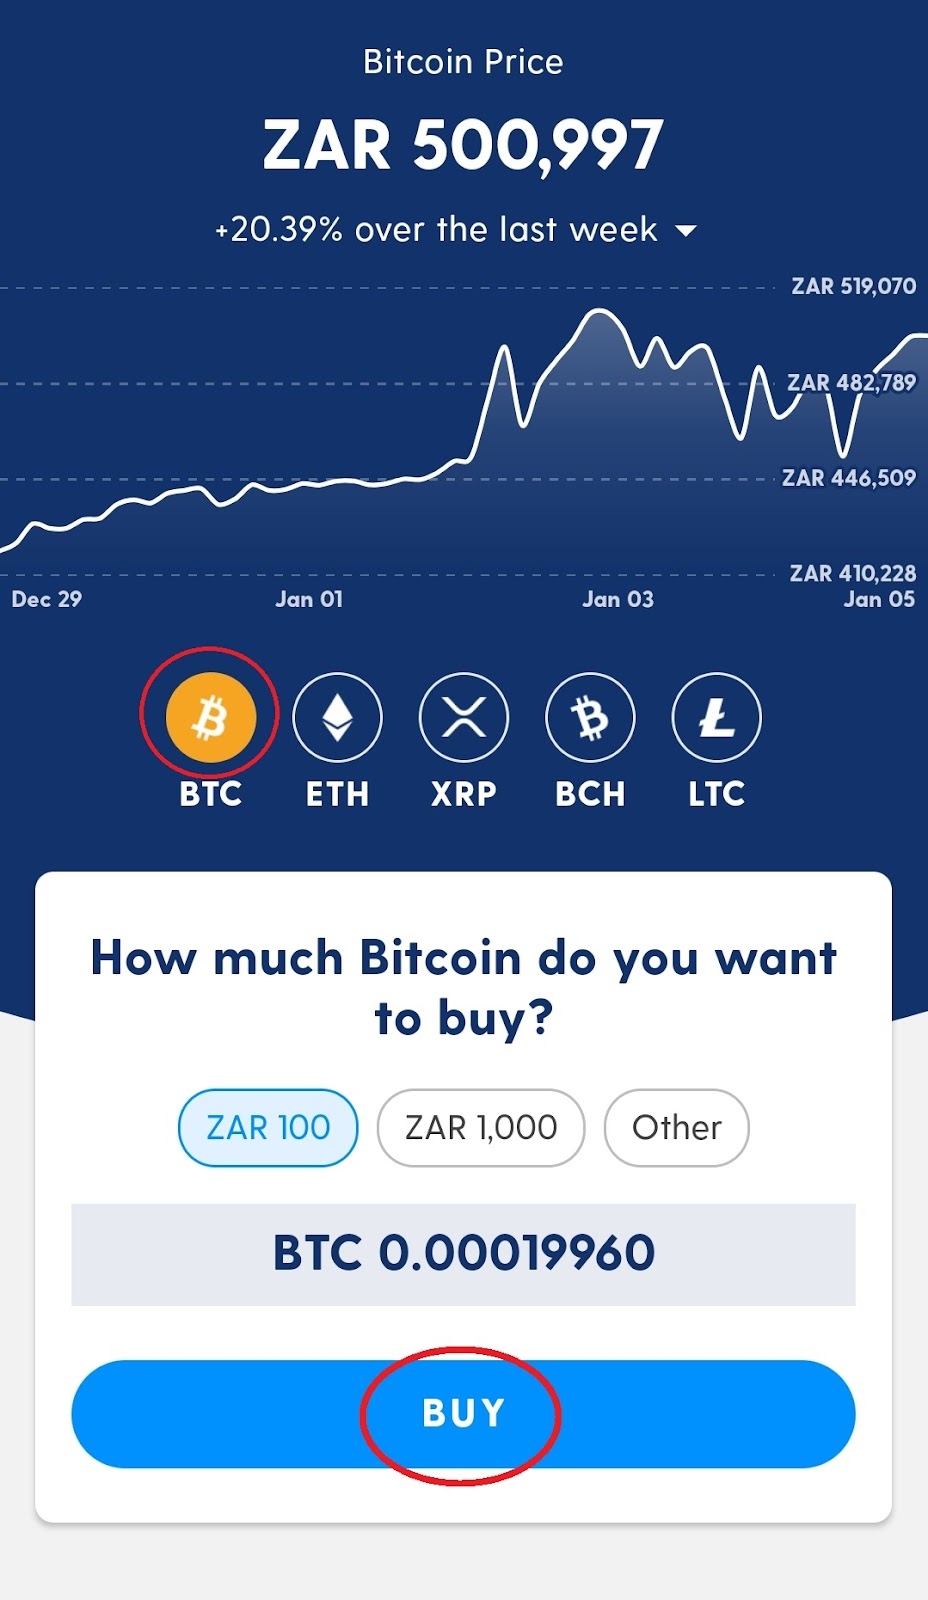 luno btc zar bitcoin trade confiavel